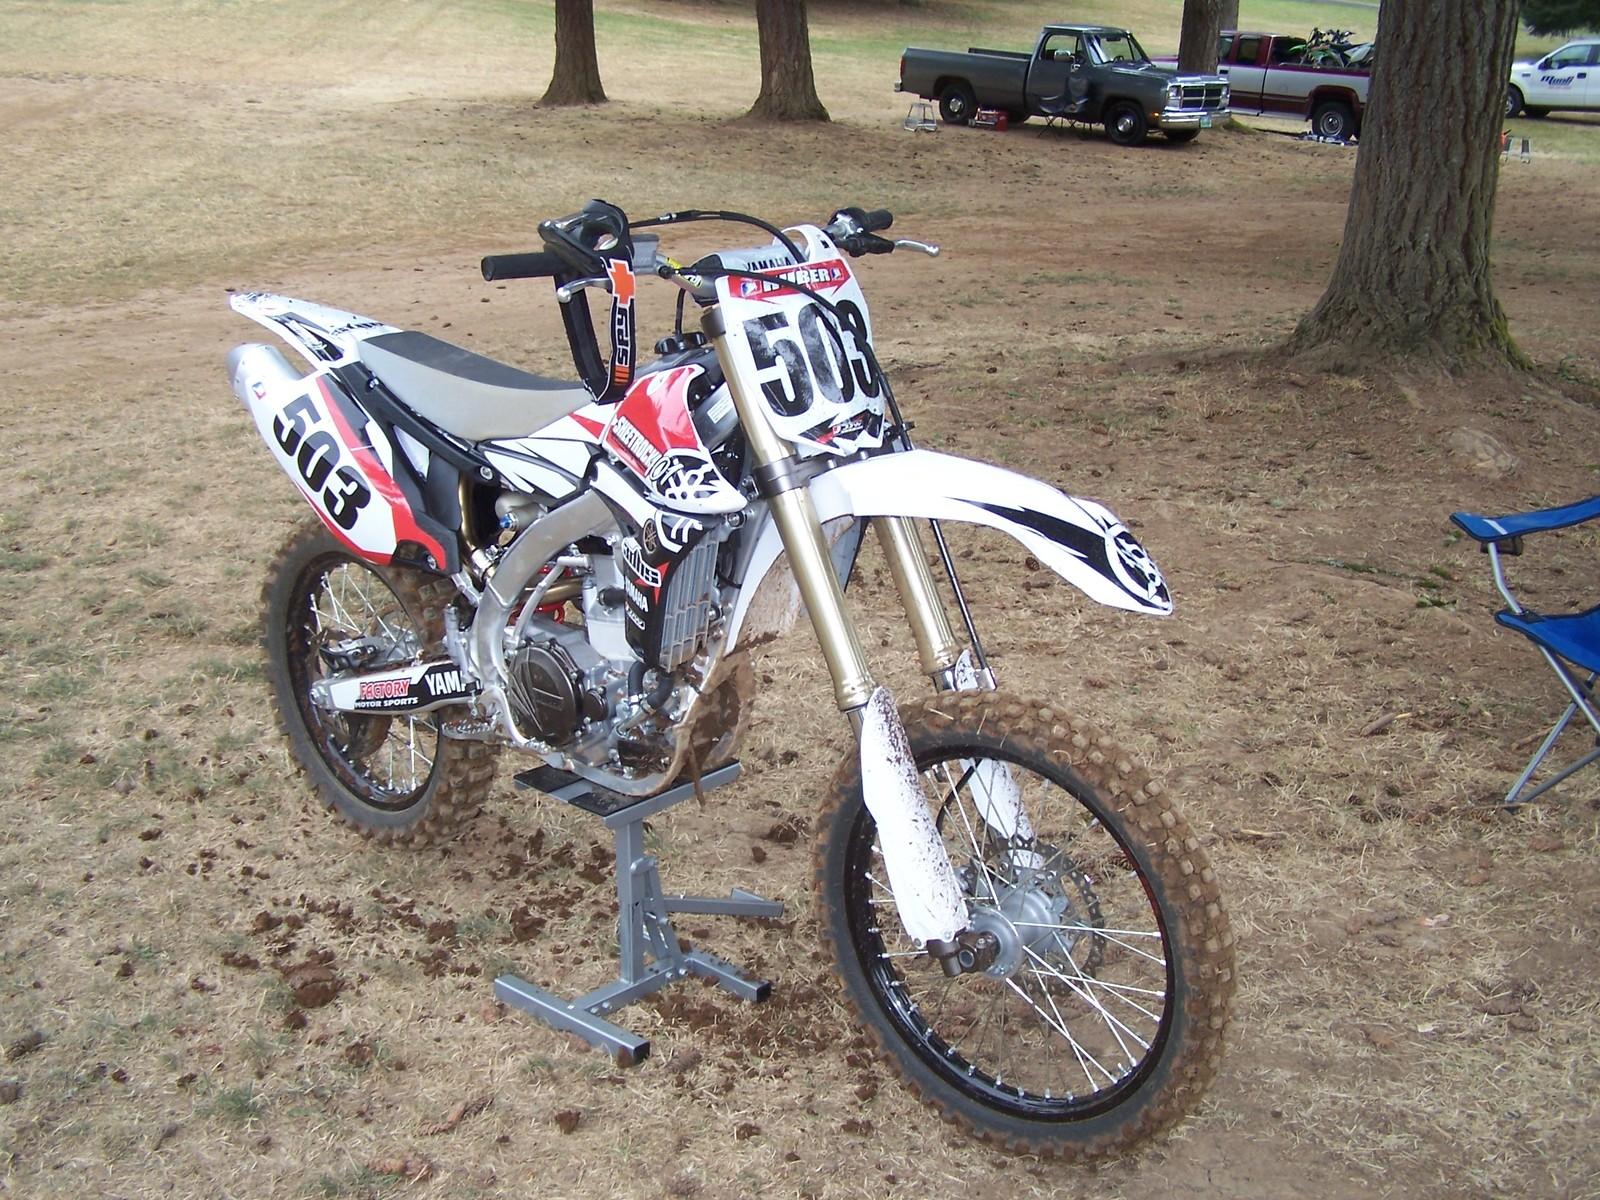 Huber YZ450F 1 - jeffro503 - Motocross Pictures - Vital MX